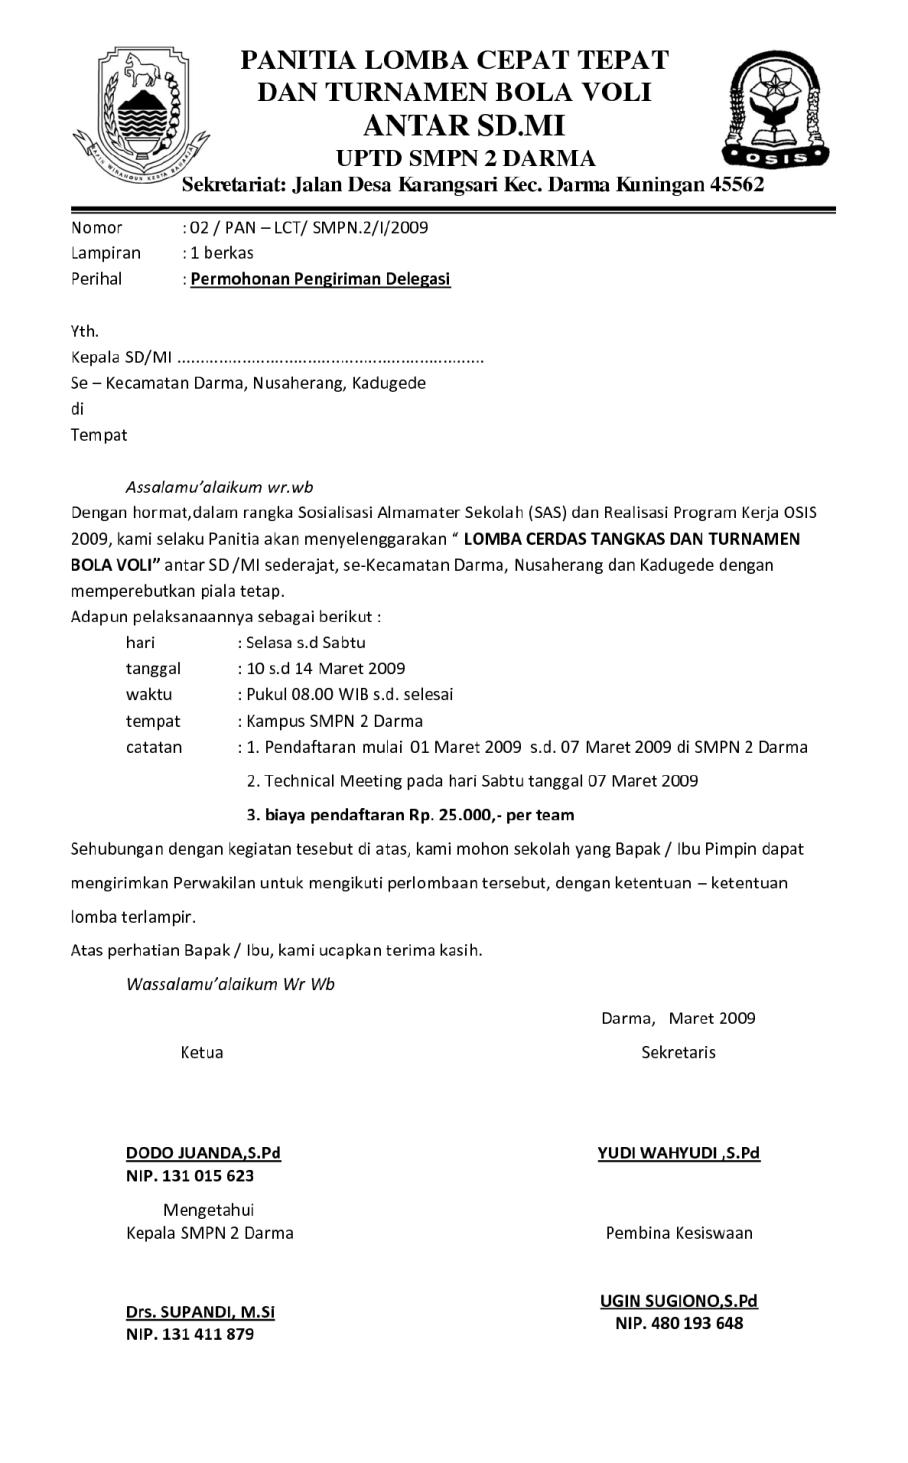 15. Contoh Surat Pemberitahuan Sekolah